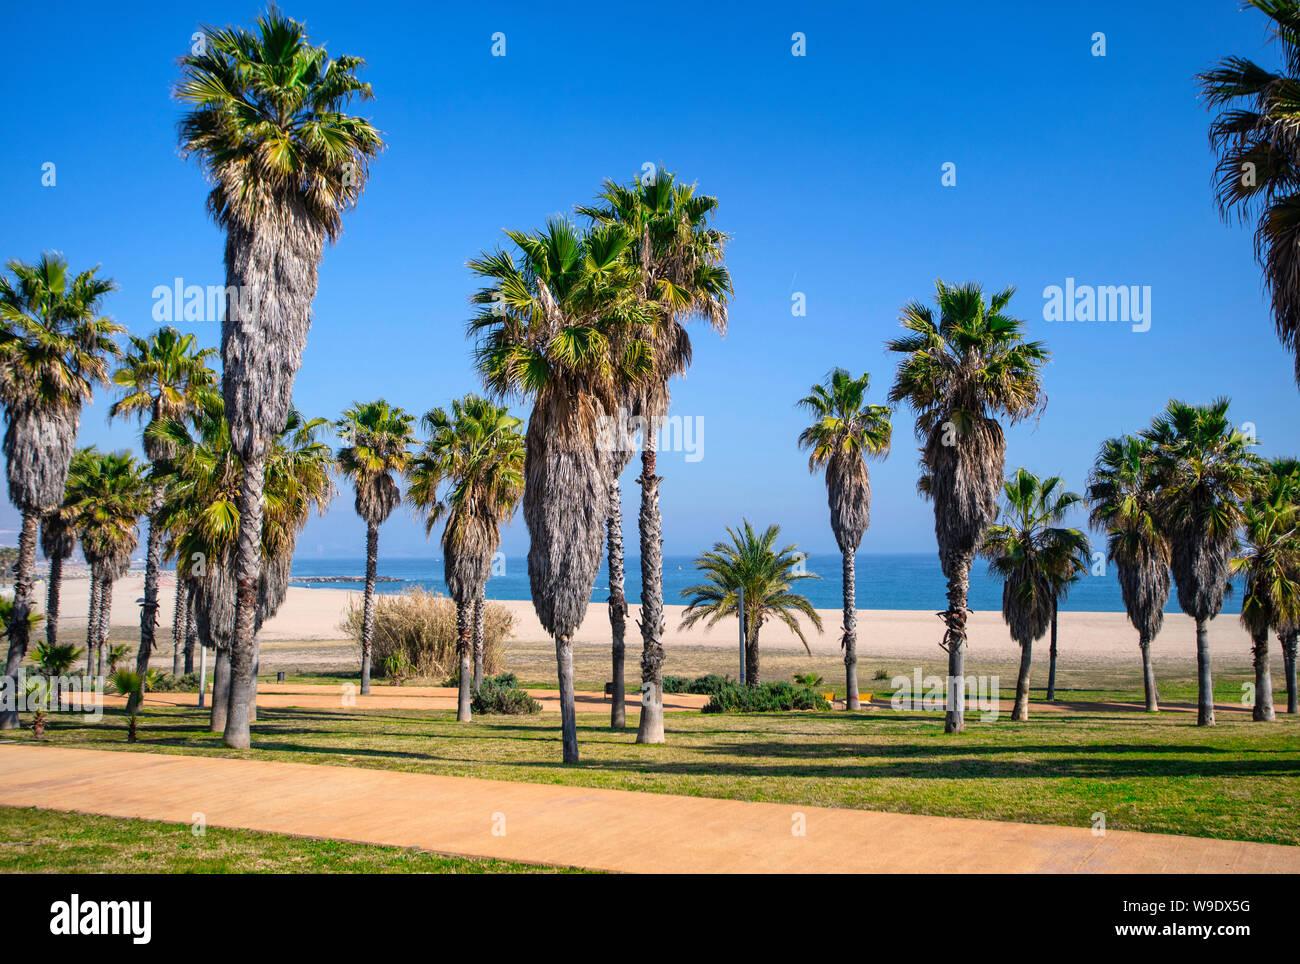 Barcelona City, Diagonal Mar District, Besos Beach. Stock Photo